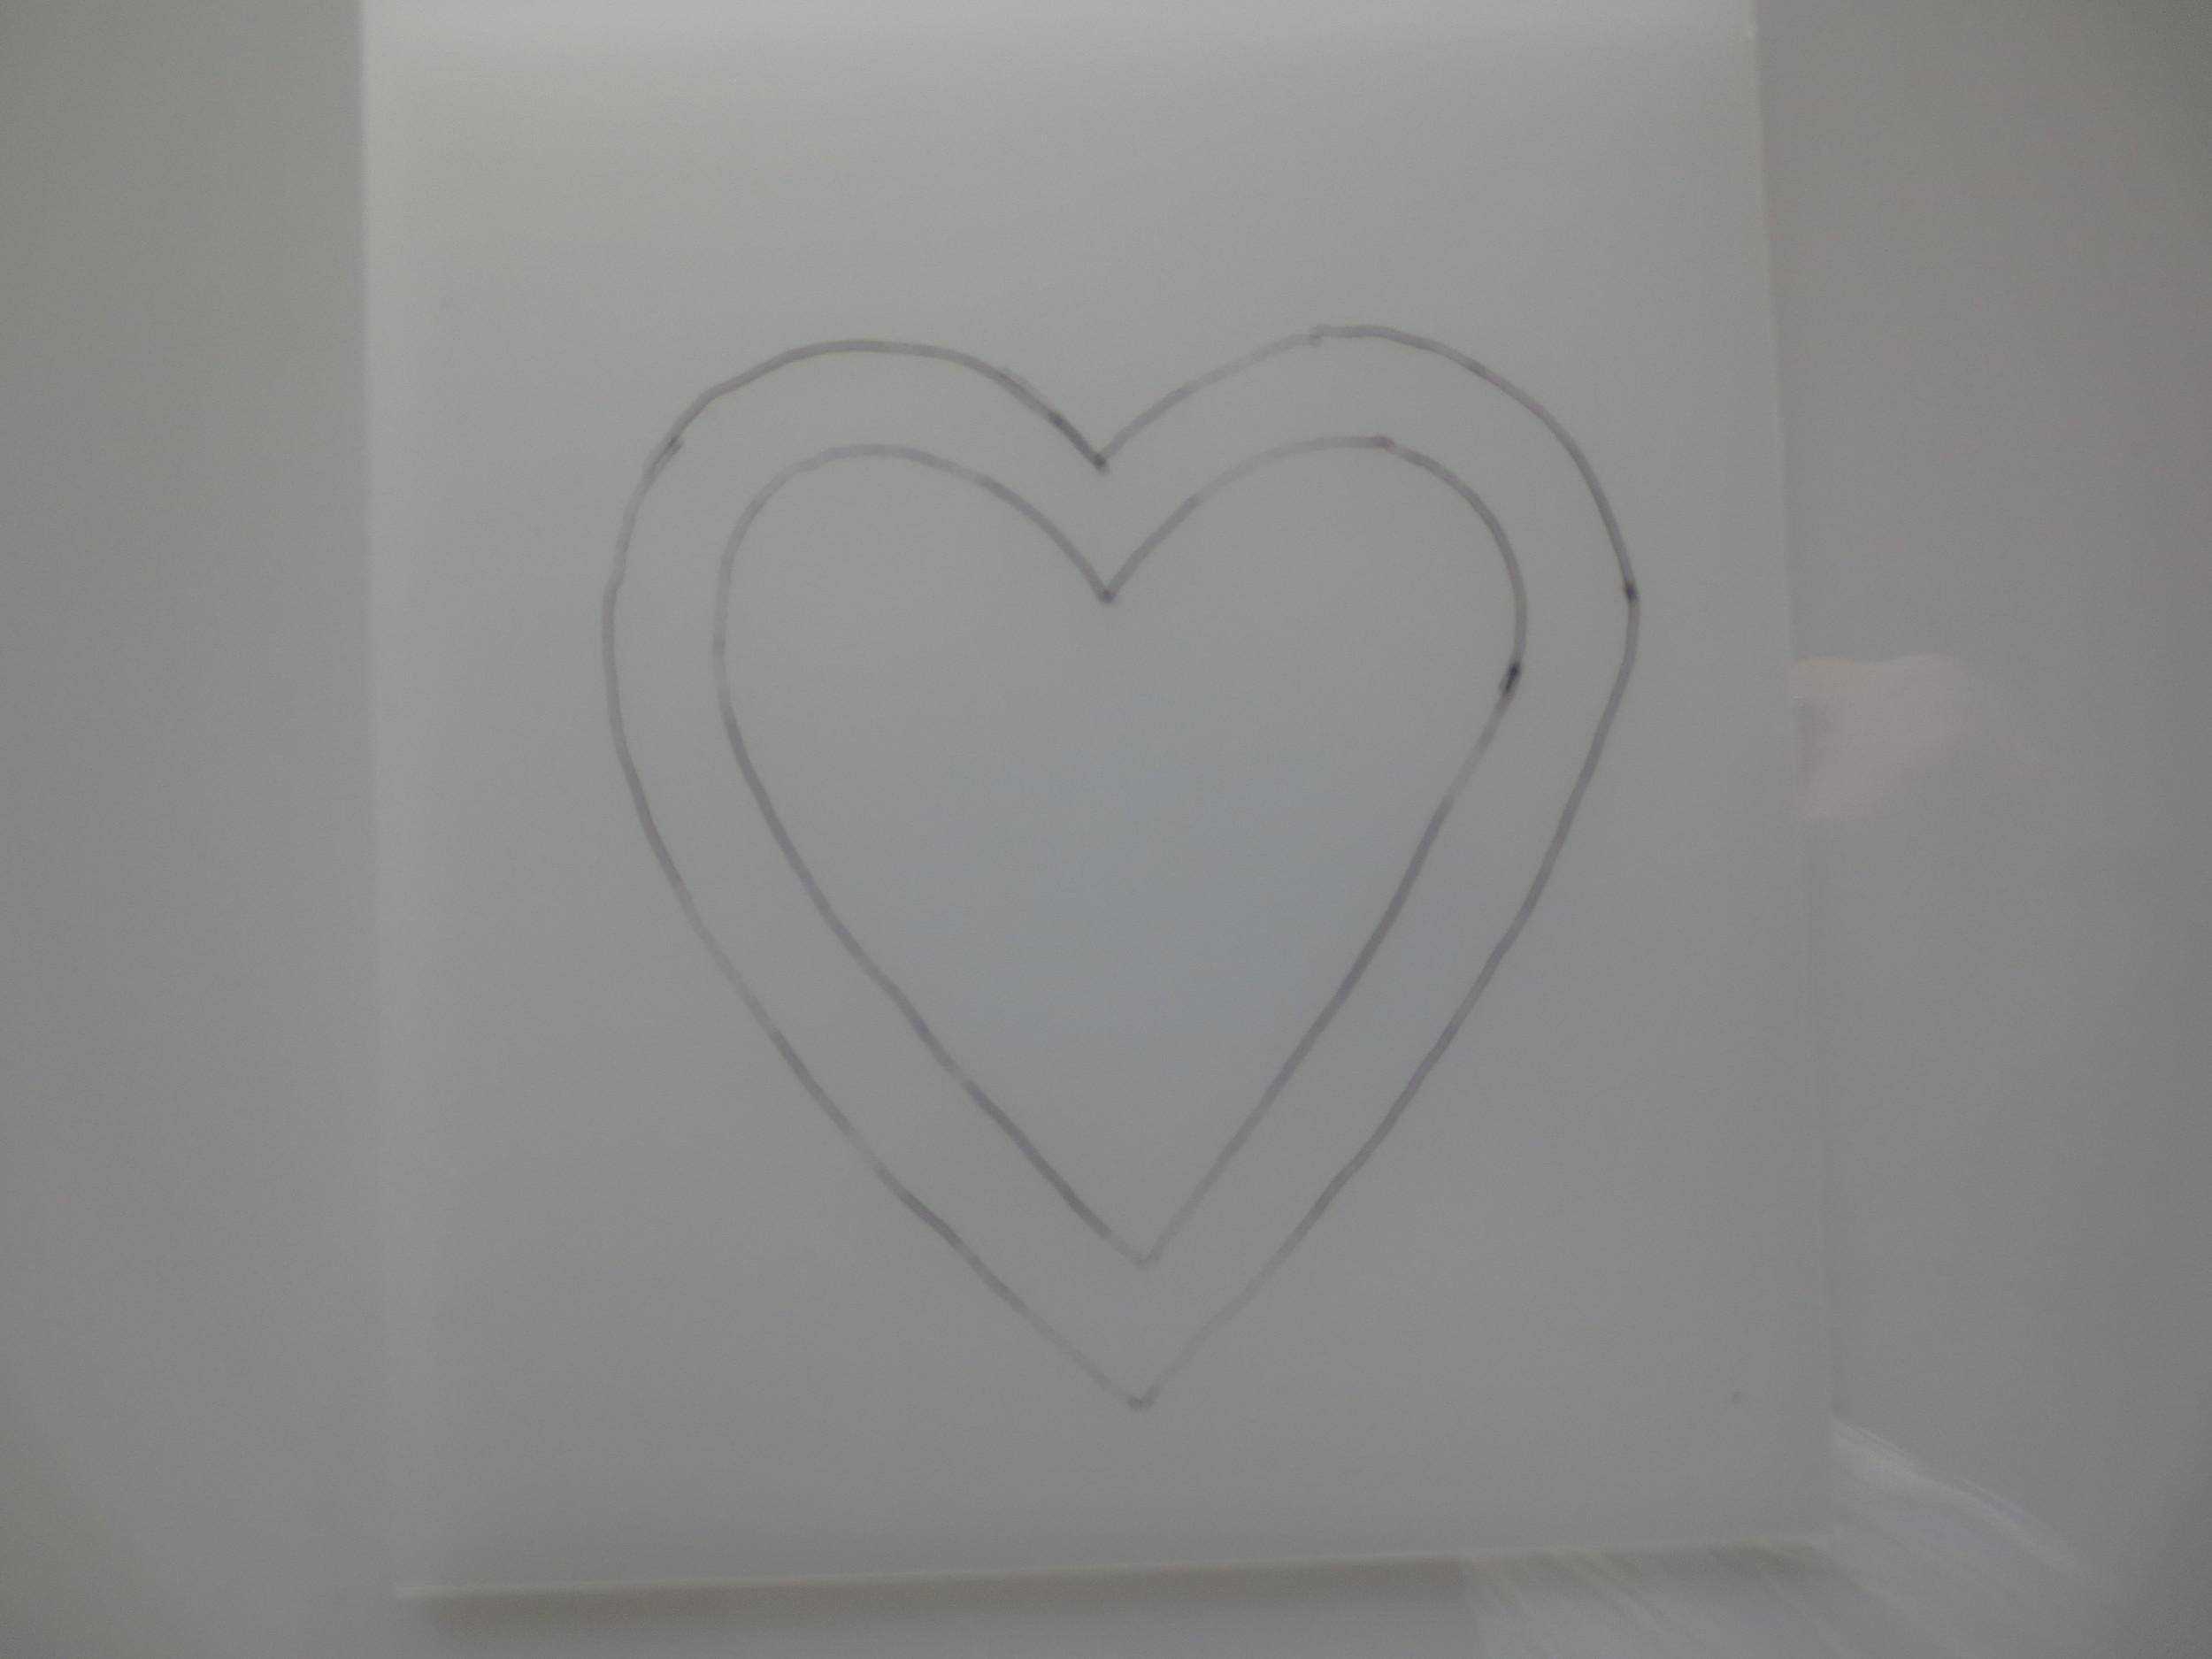 heart stencil2.jpg